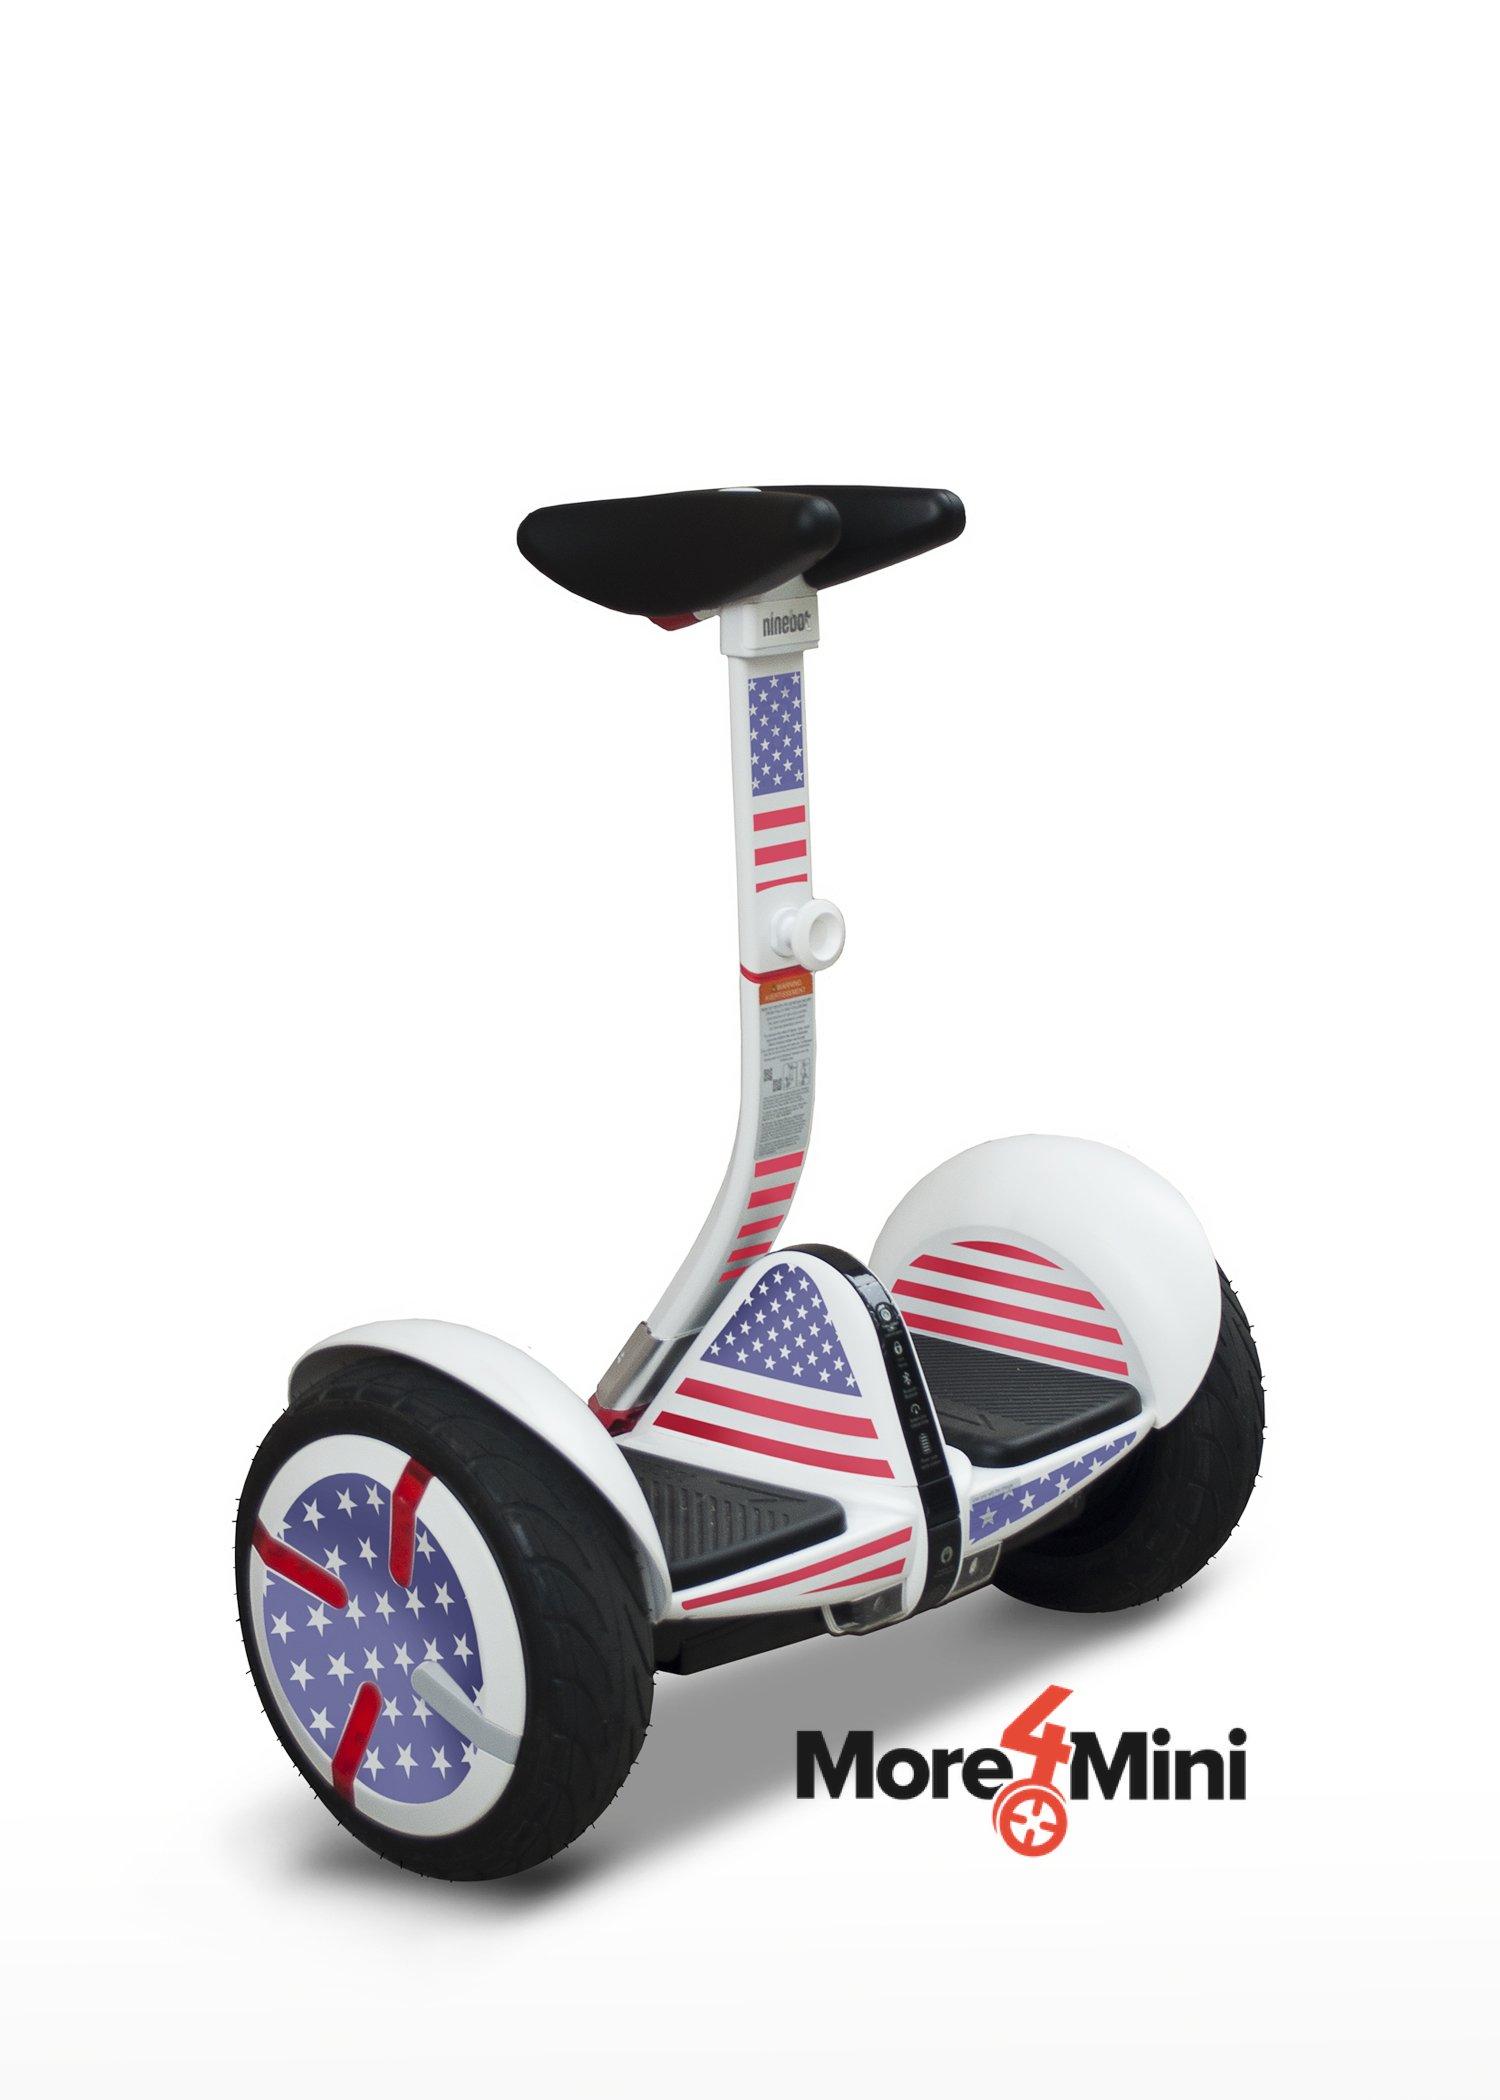 More4Mini Kit for Segway Mini Pro - US Flag (Does not Include Segway MiniPro)